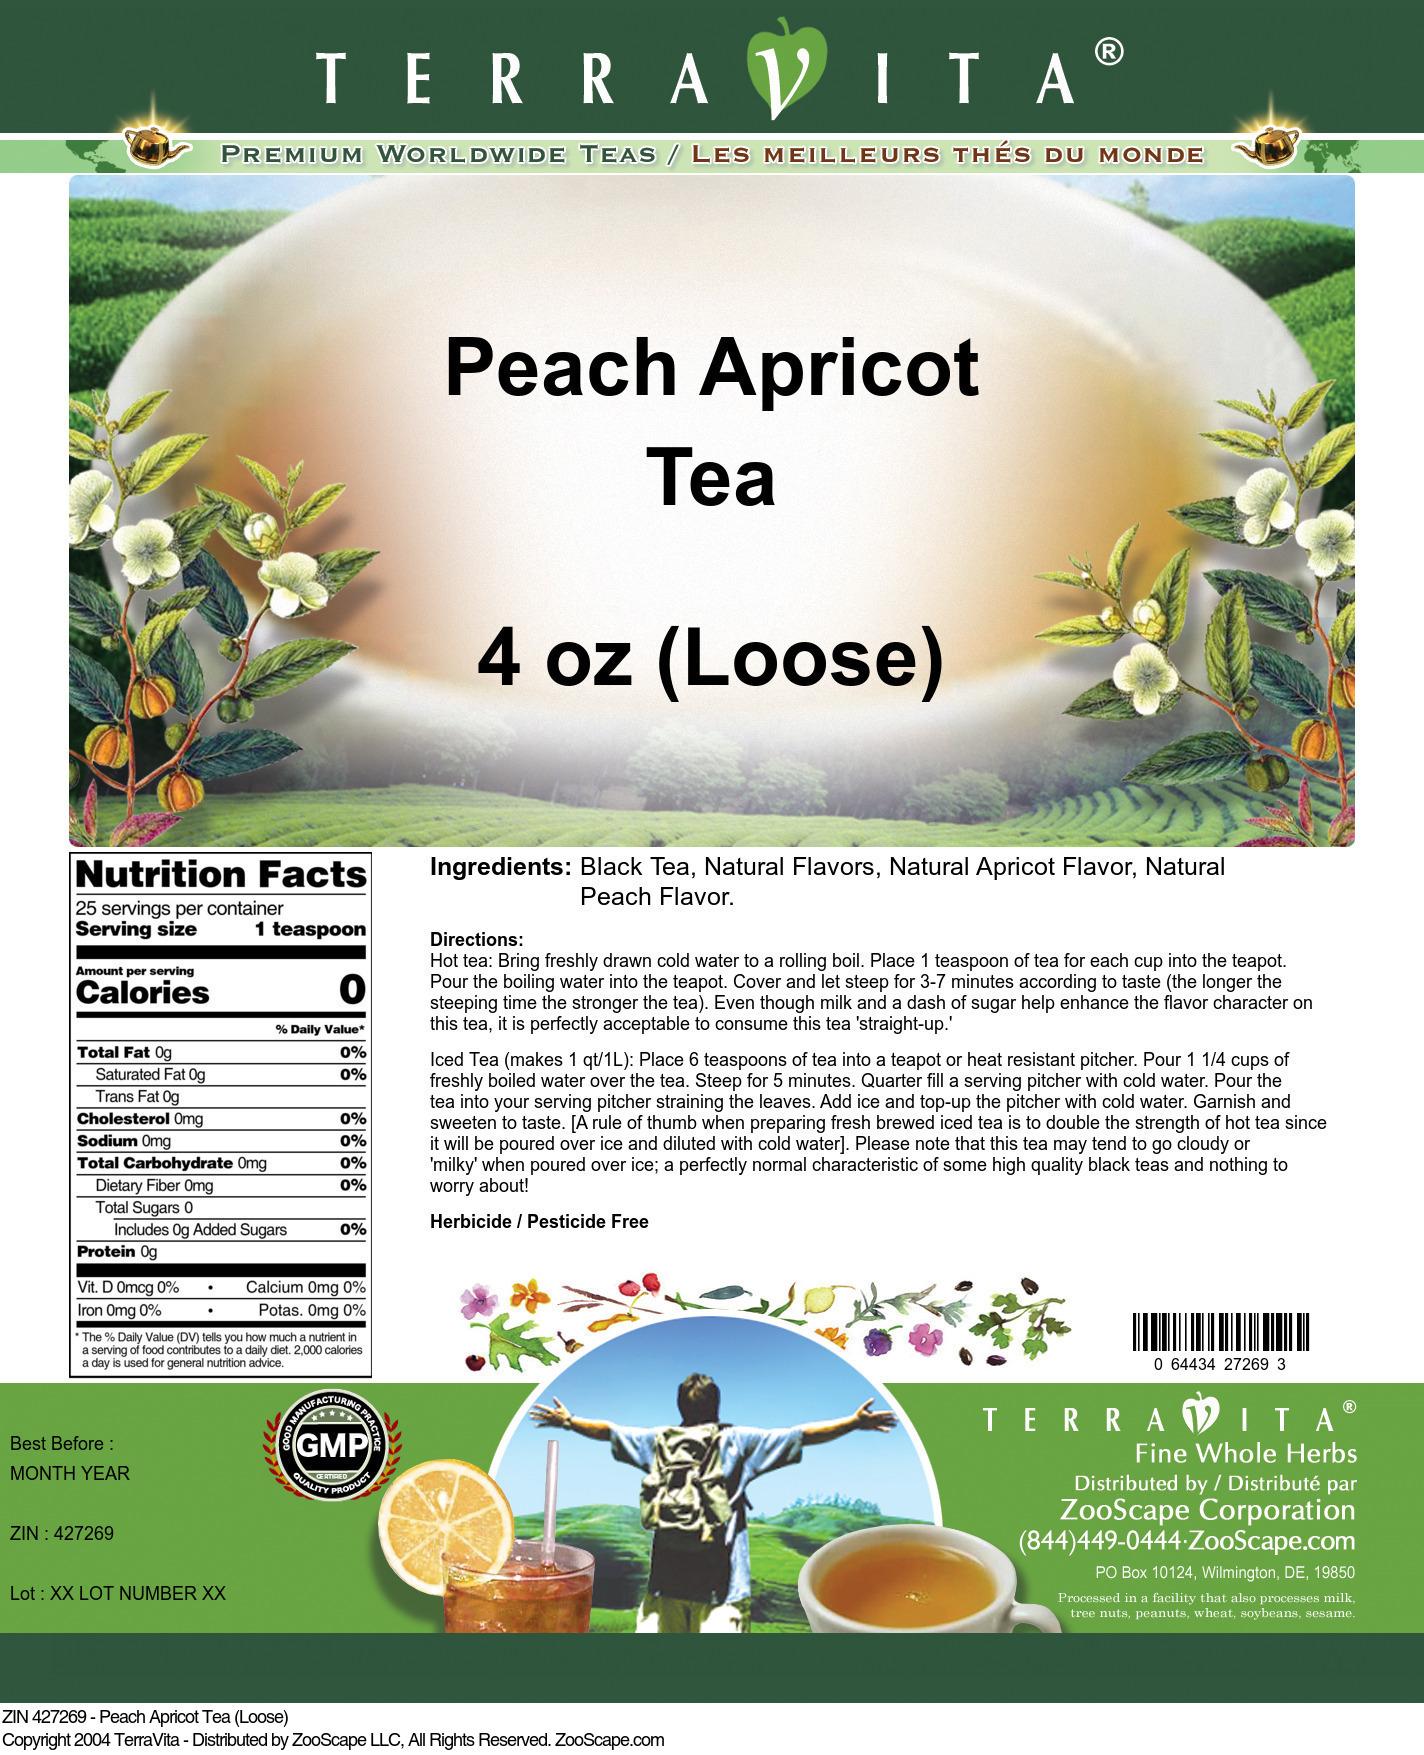 Peach Apricot Black Tea